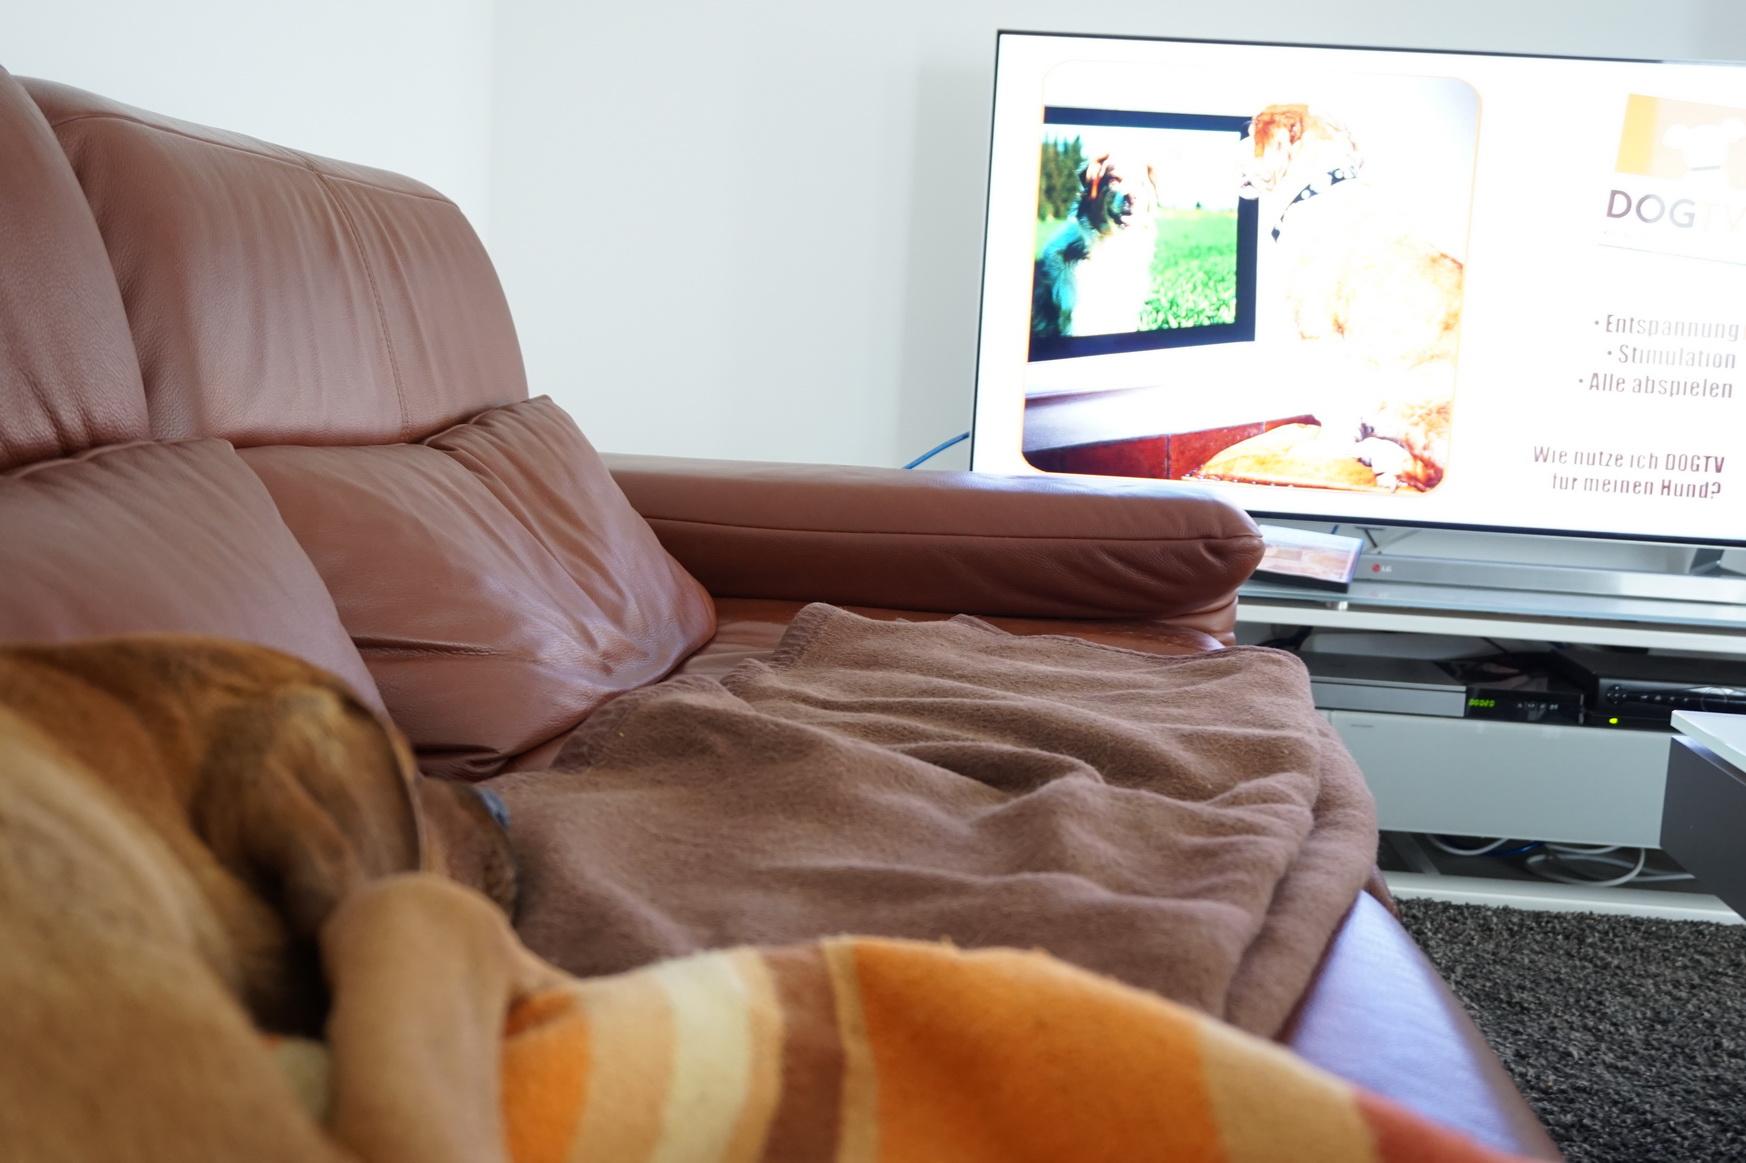 0609 DogTV 4